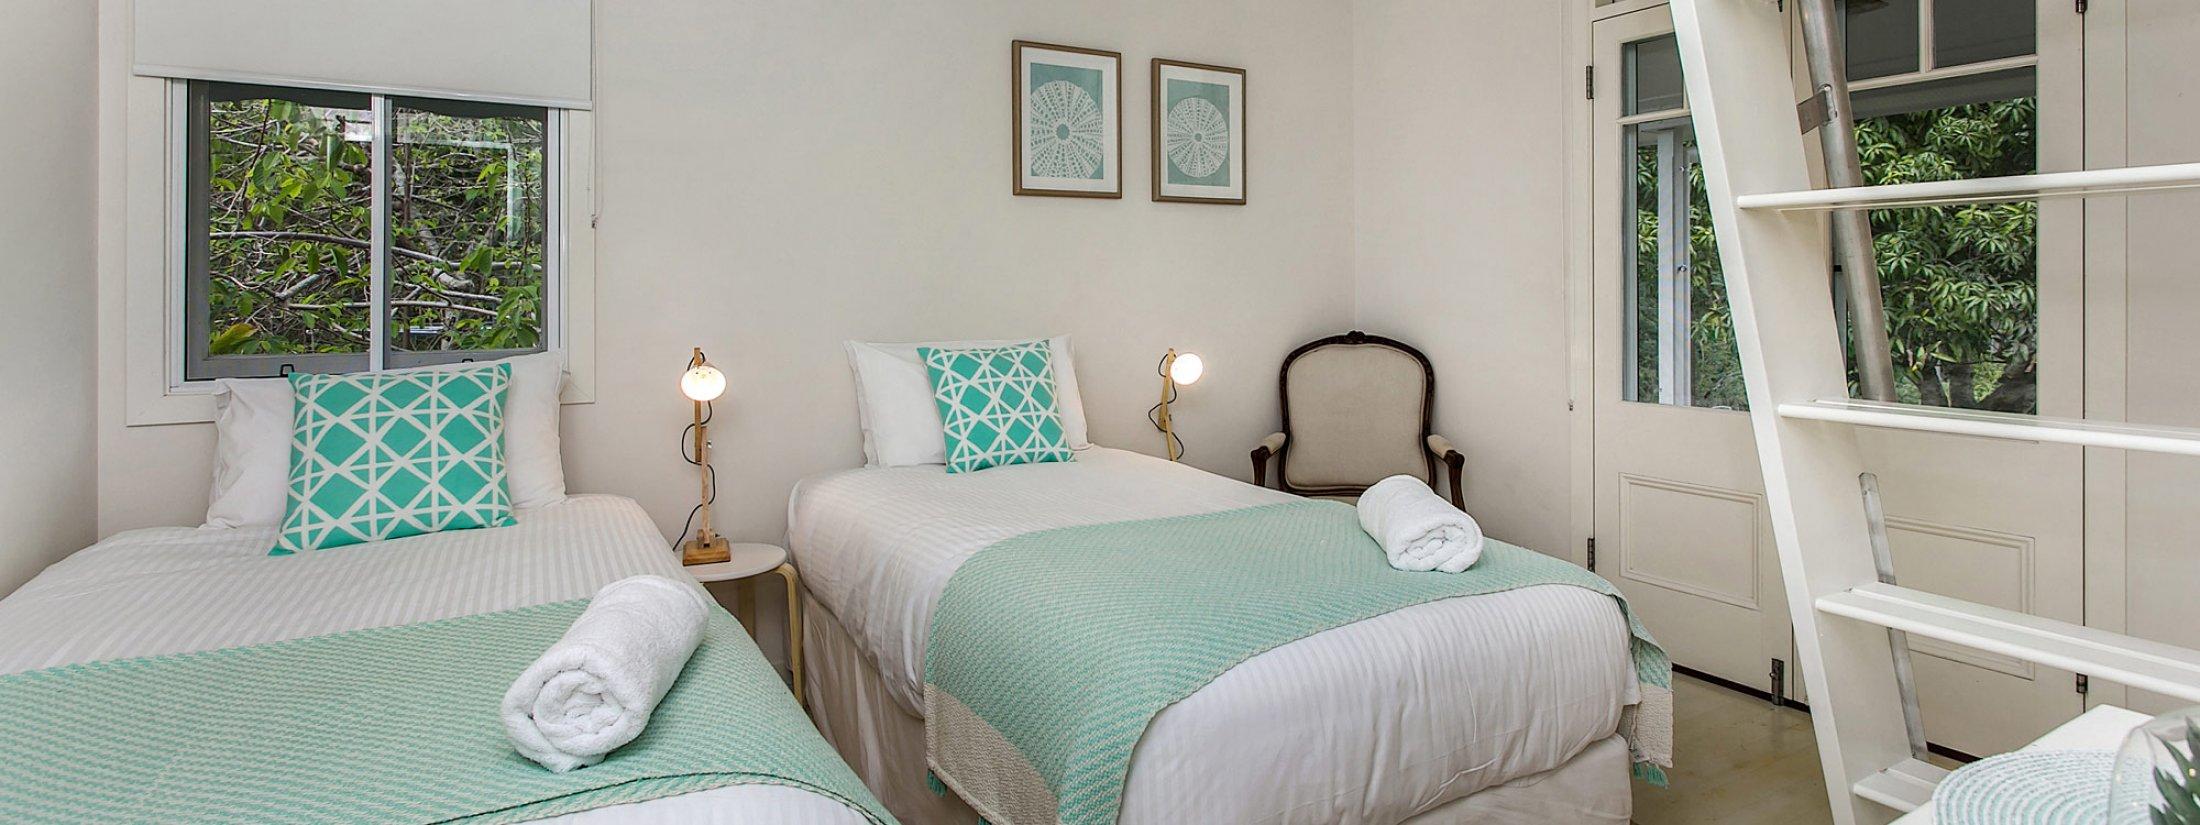 Byron Creek Homestead - Byron Bay - House 2 Bedroom 2